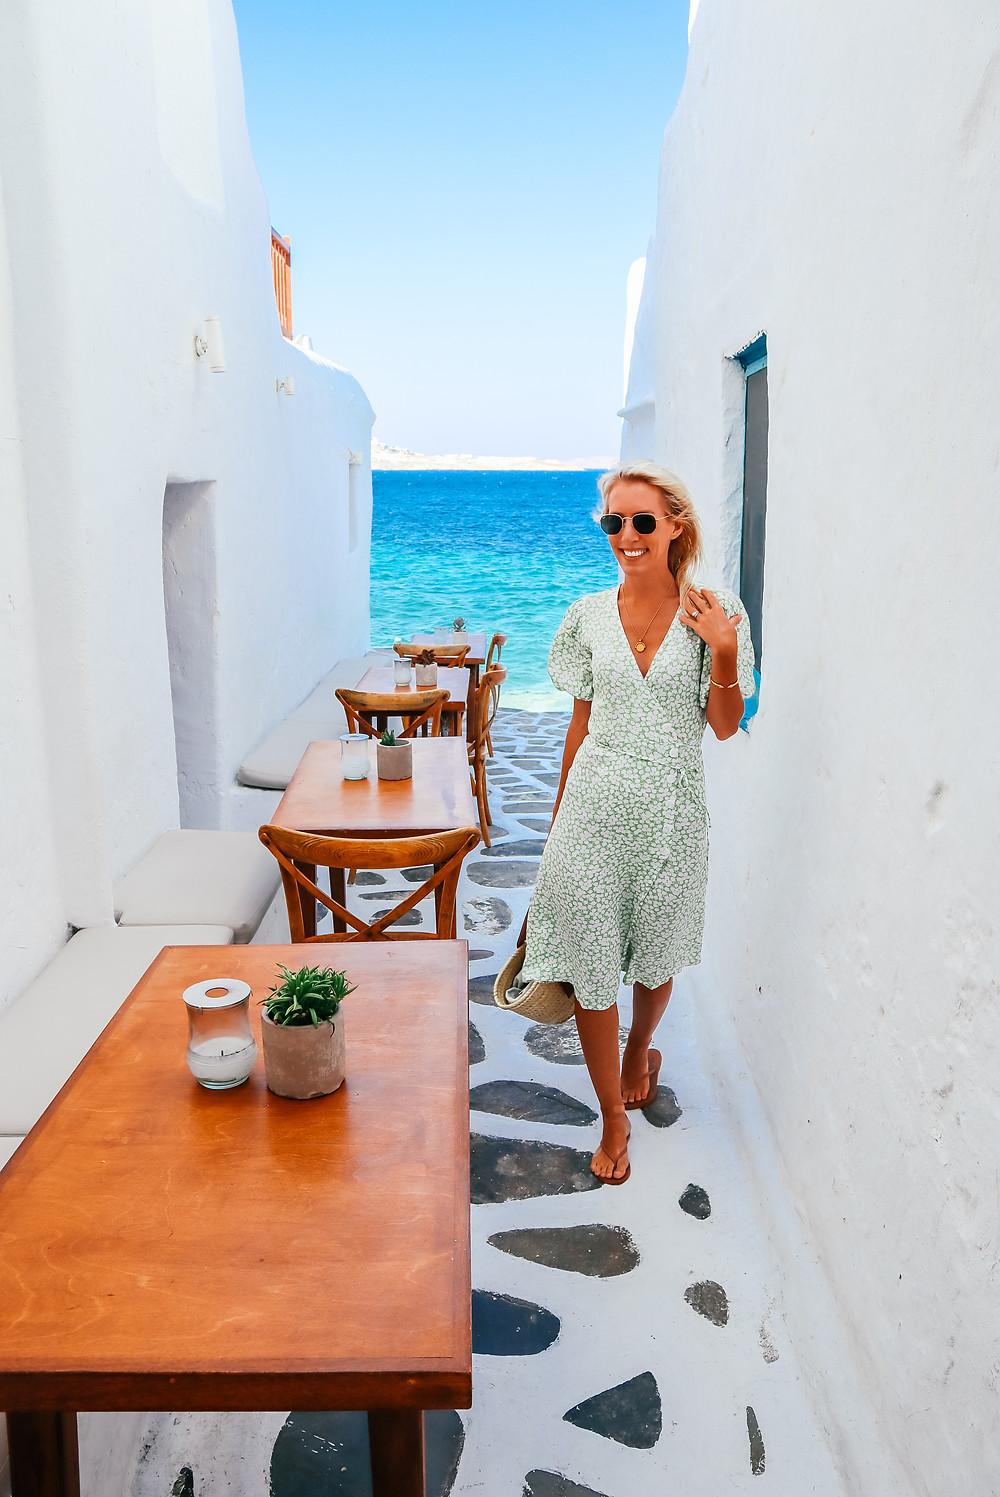 A Guide to Mykonos l Travel Guide l 2 Days in Mykonos l A Style Alike l Greece Island Hopping (15)